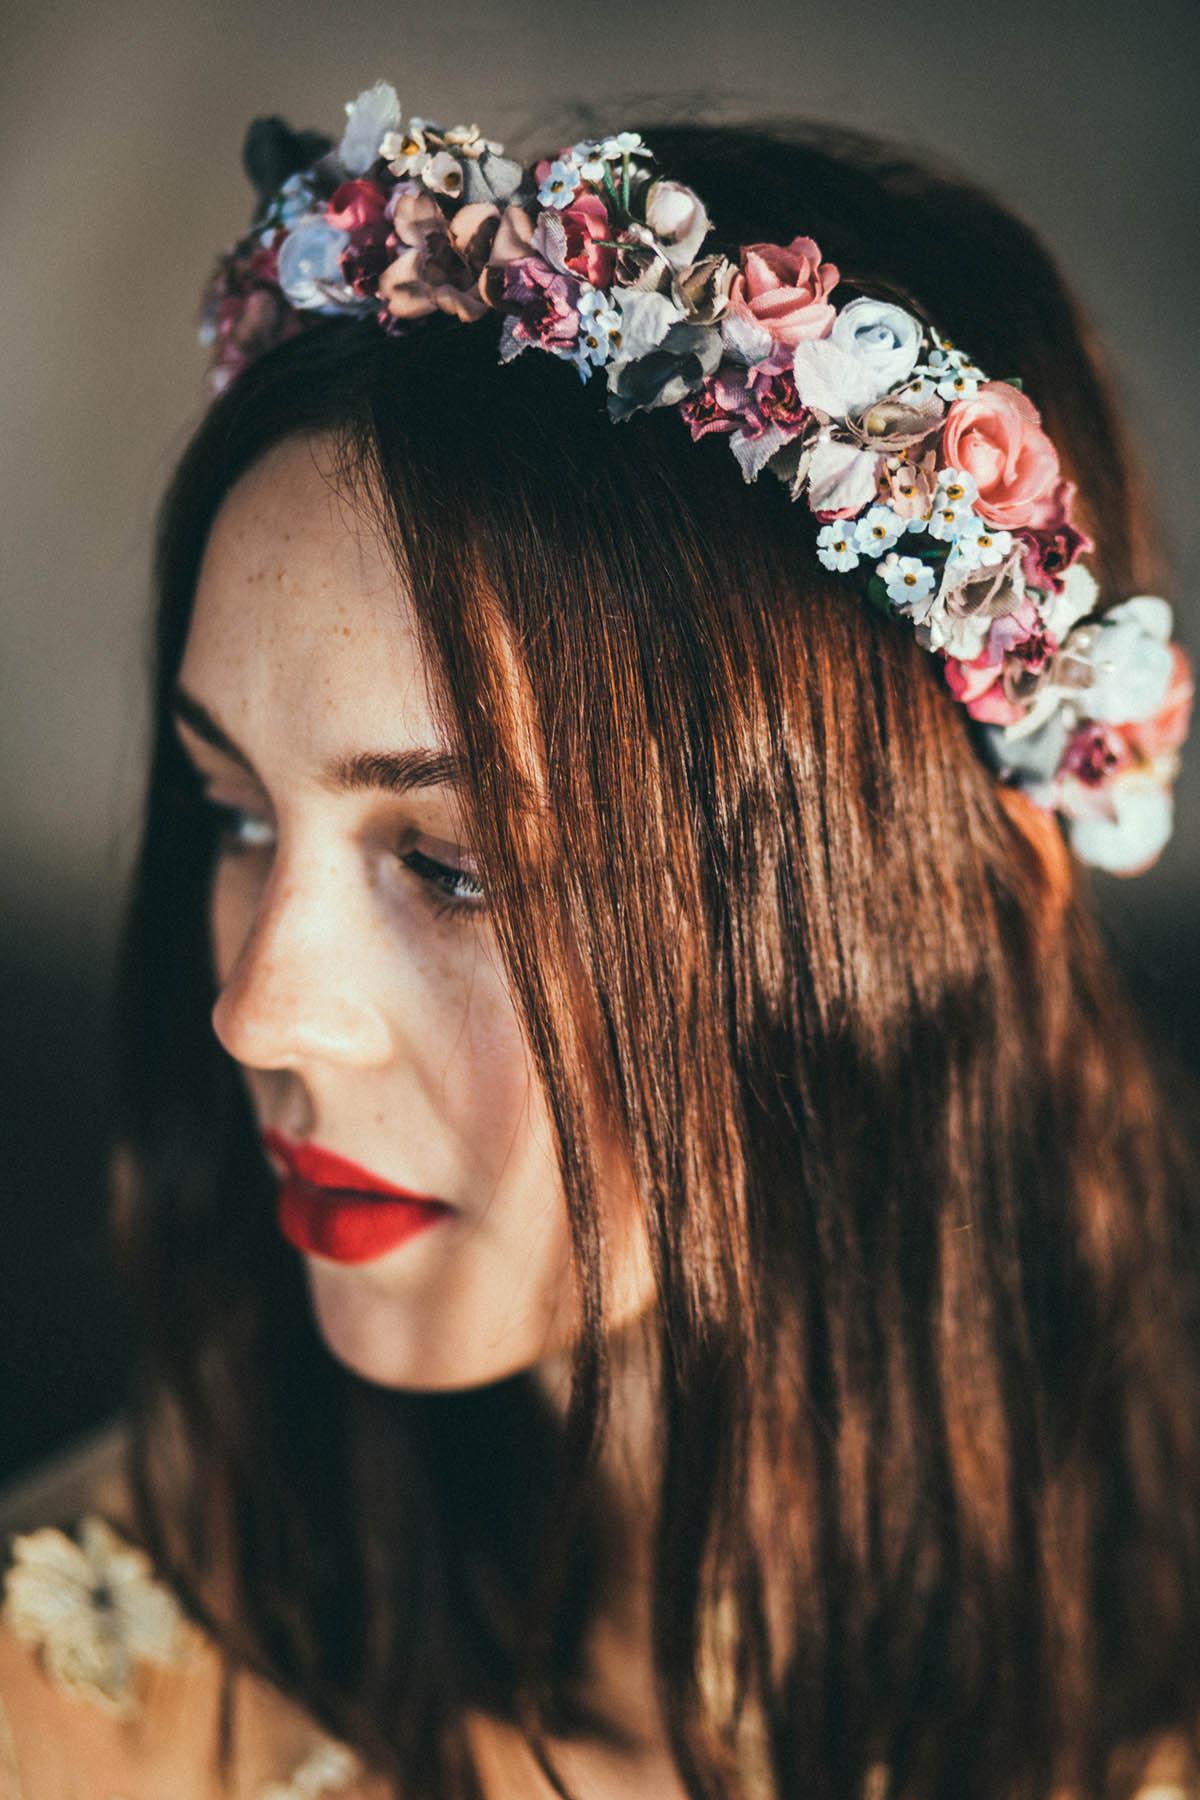 We-Are-Flowergirls_Lookbook_Flowercrown_Blumenkranz_SS17_c_Lupi-Spuma_Web_14.jpg